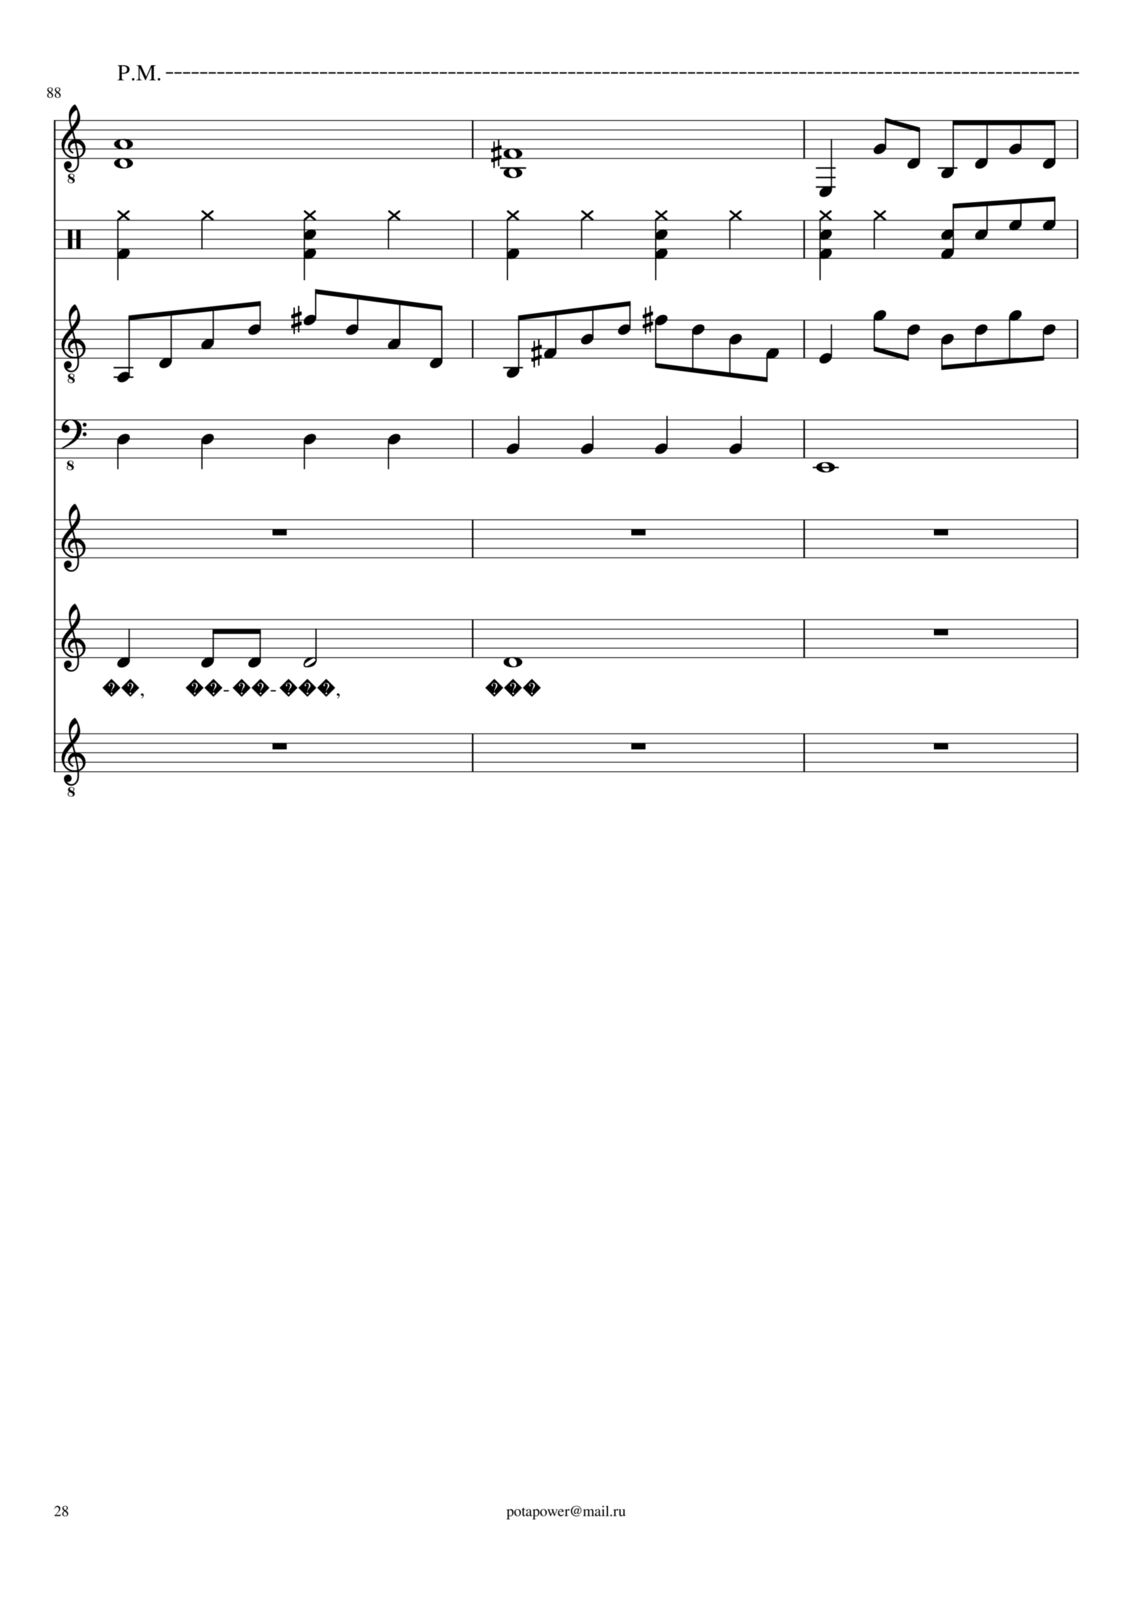 Ten lyubvi slide, Image 28